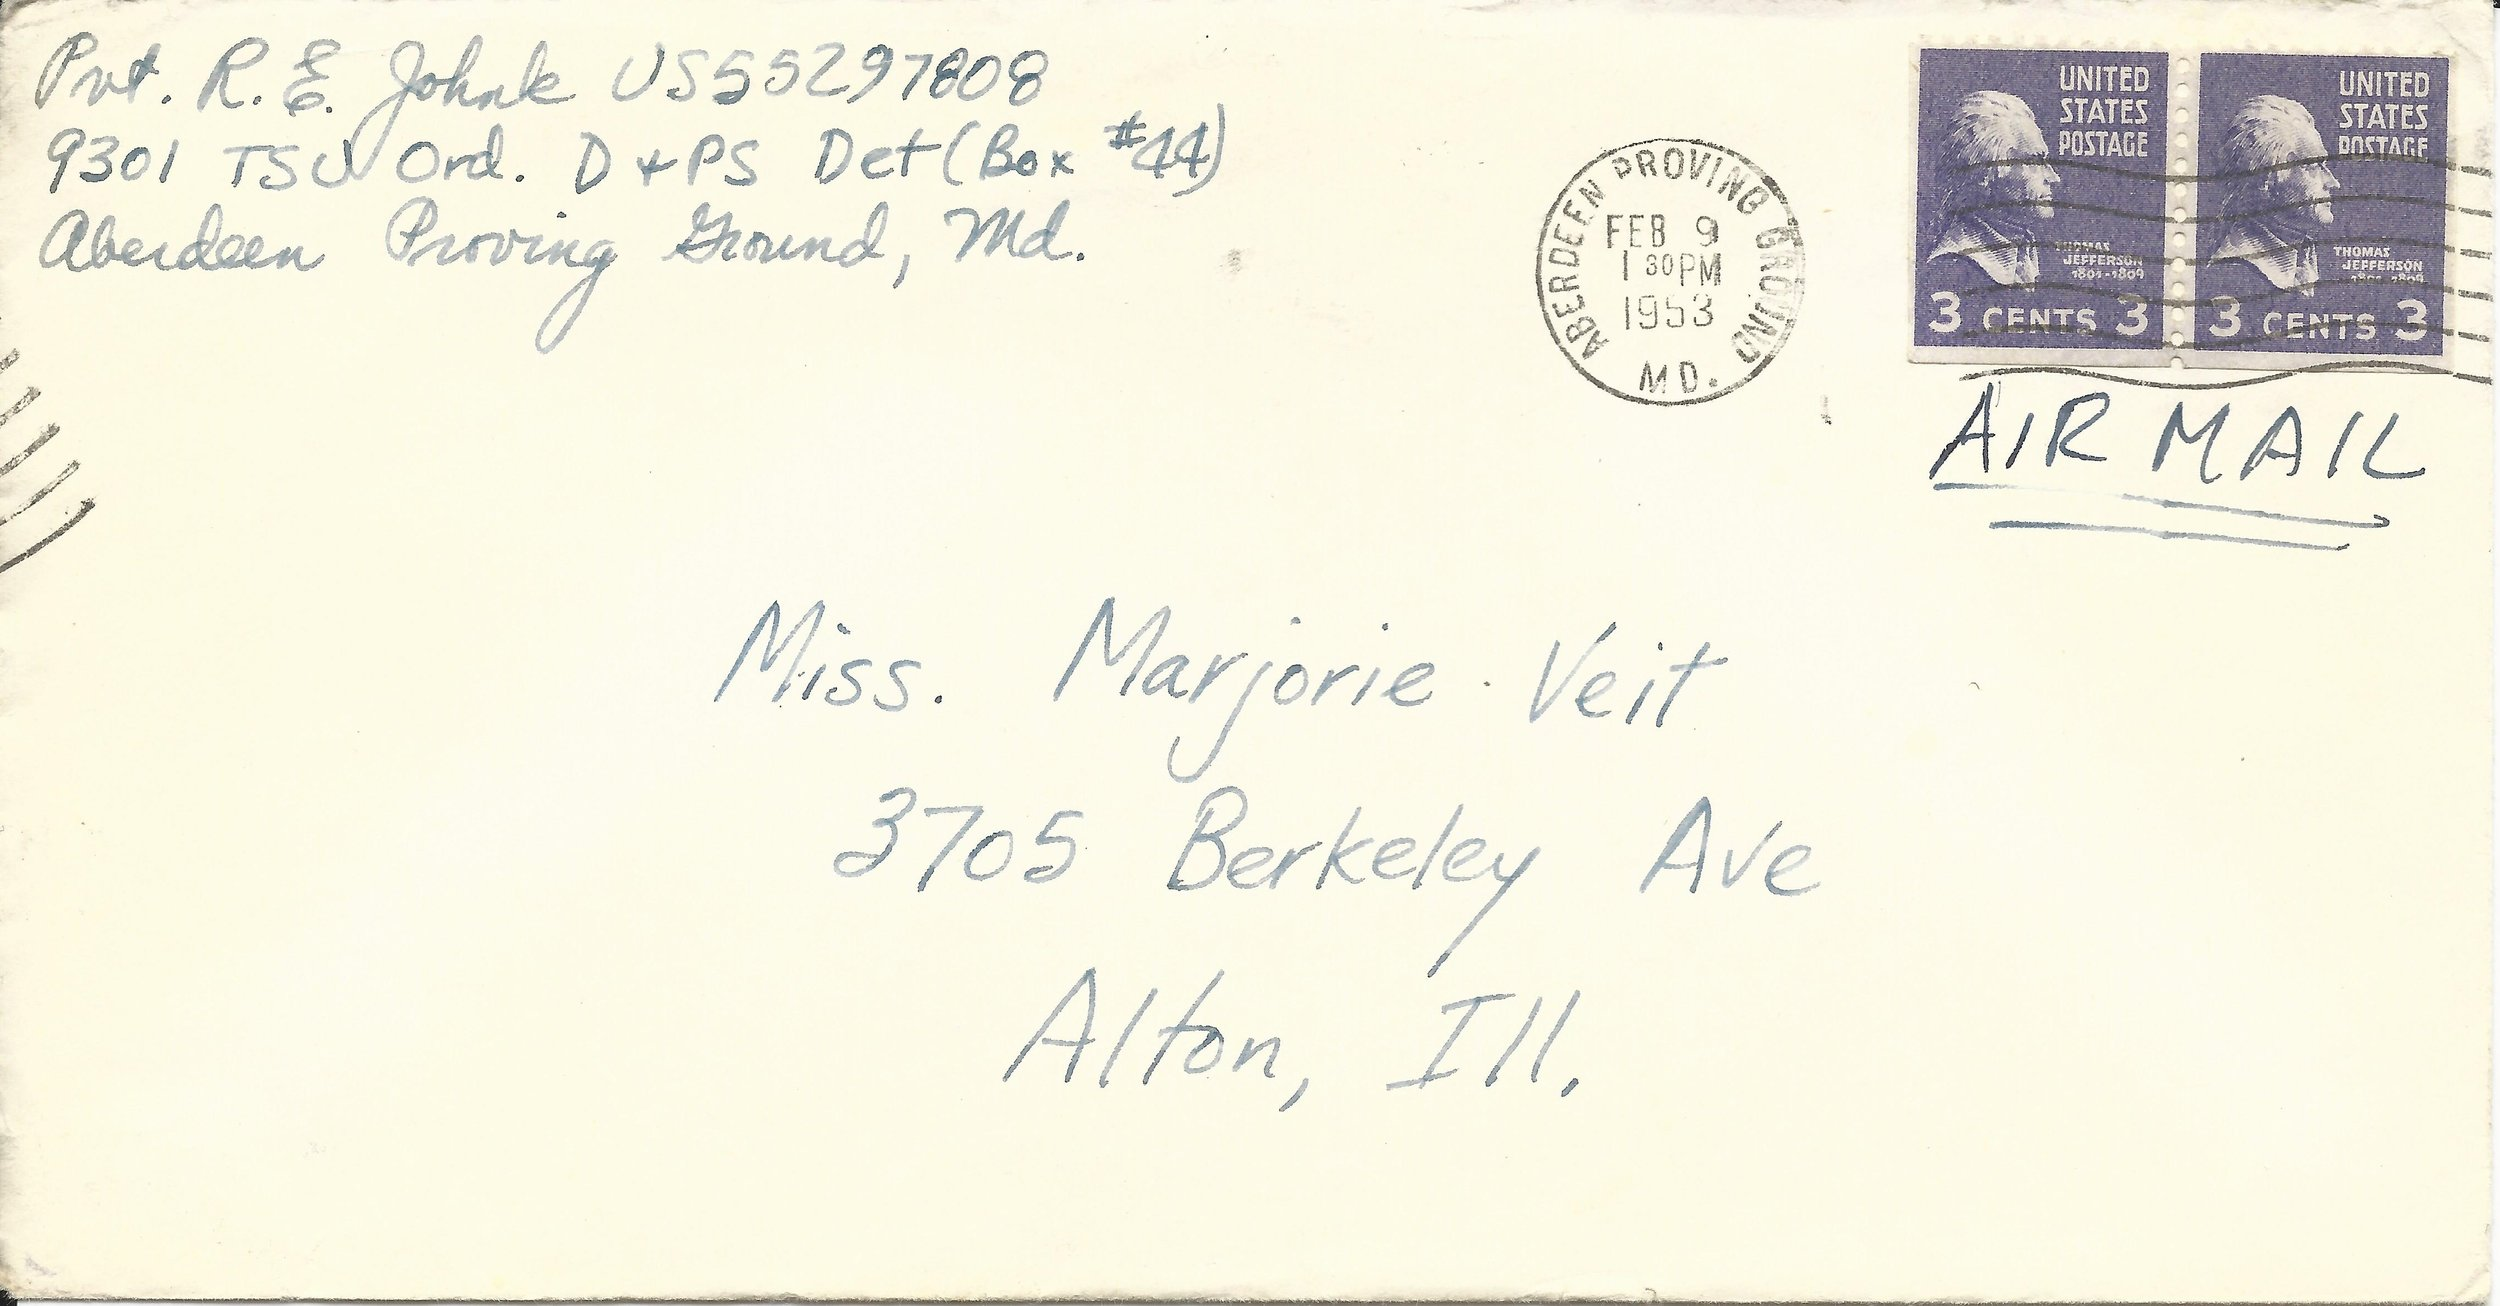 6. Feb. 8, 1953 (Opa)_Page_1.jpg